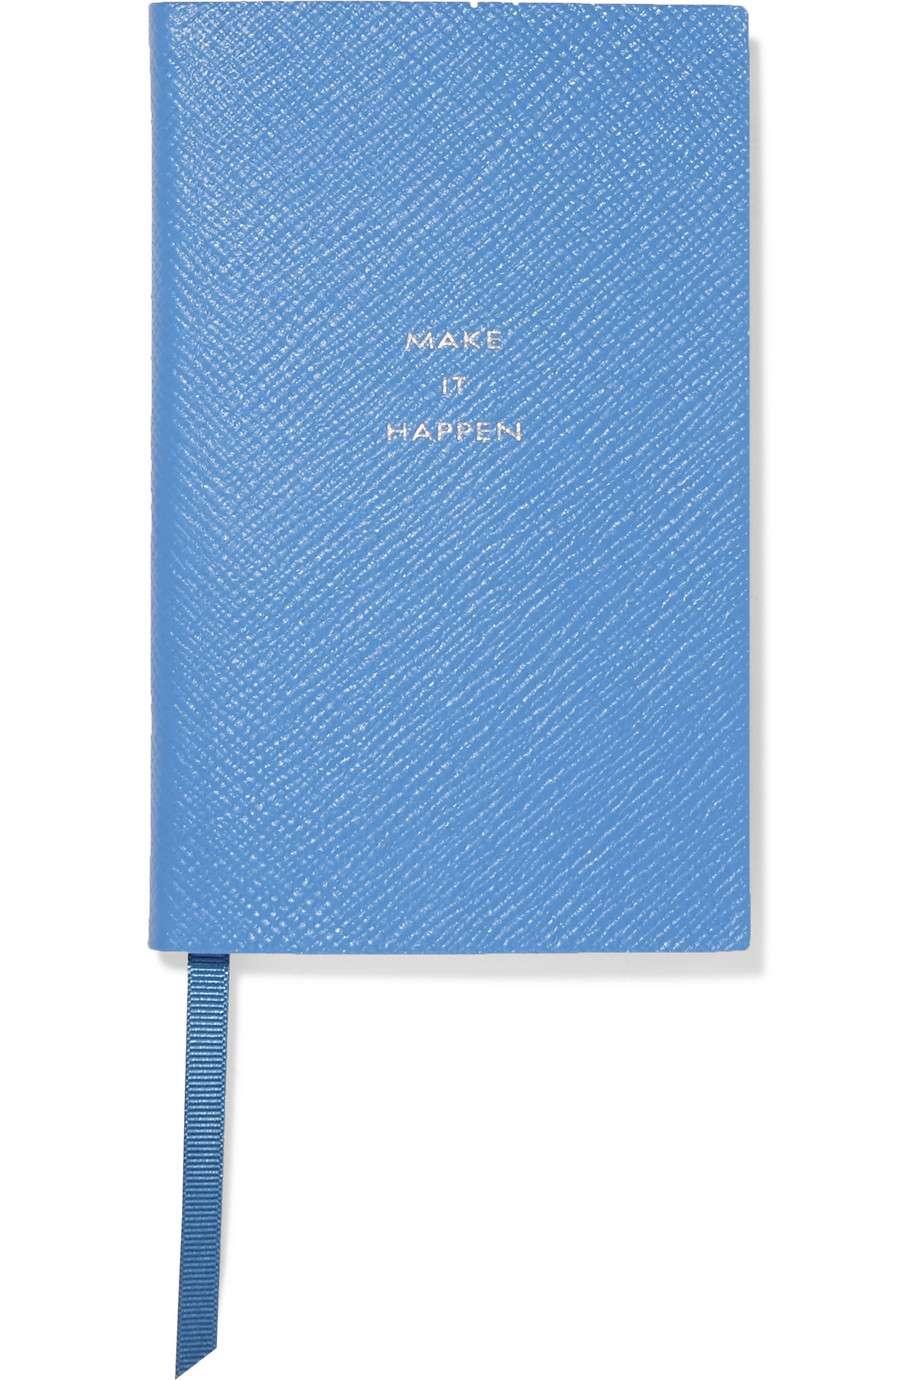 Smythson Panama Make It Happen textured-leather notebook